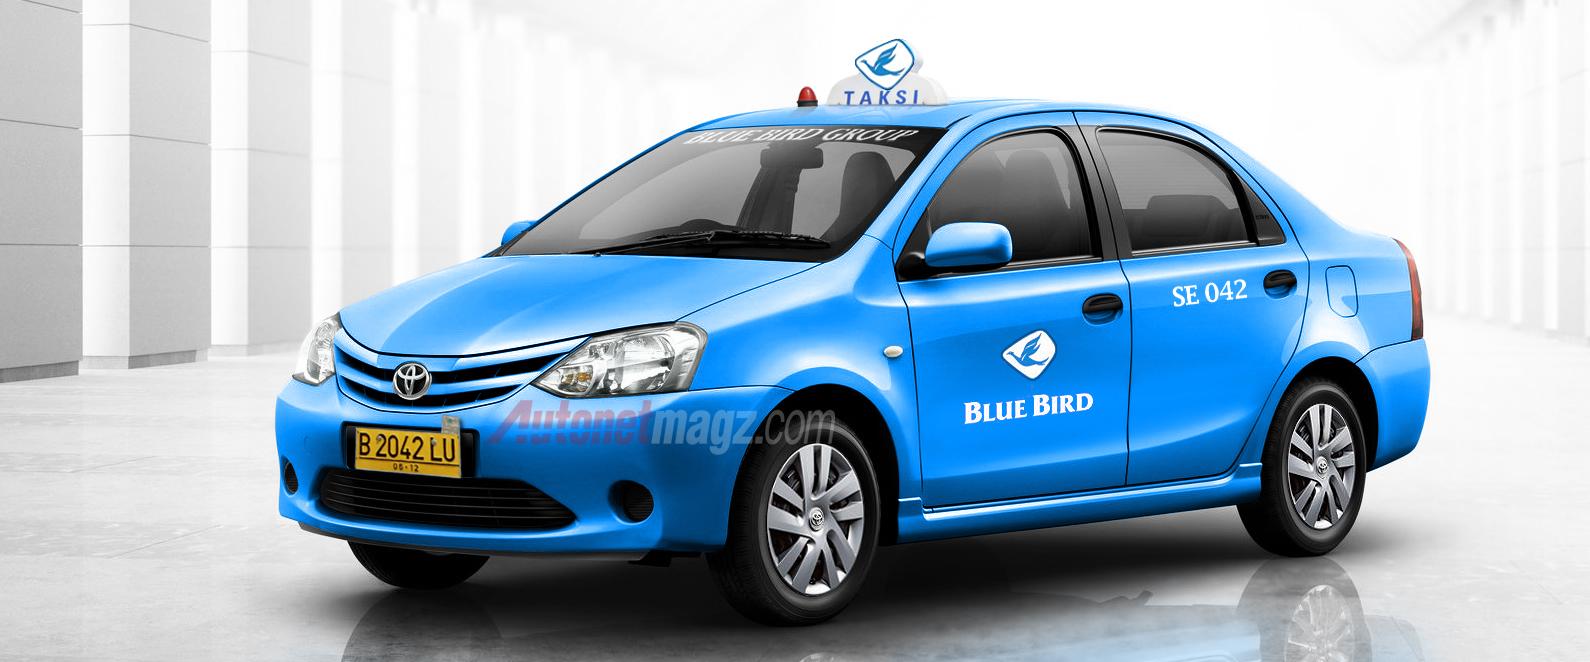 International, Toyota_Etios_Taksi: Tidak Laku, Toyota Etios Dijadikan Taksi di Brazil